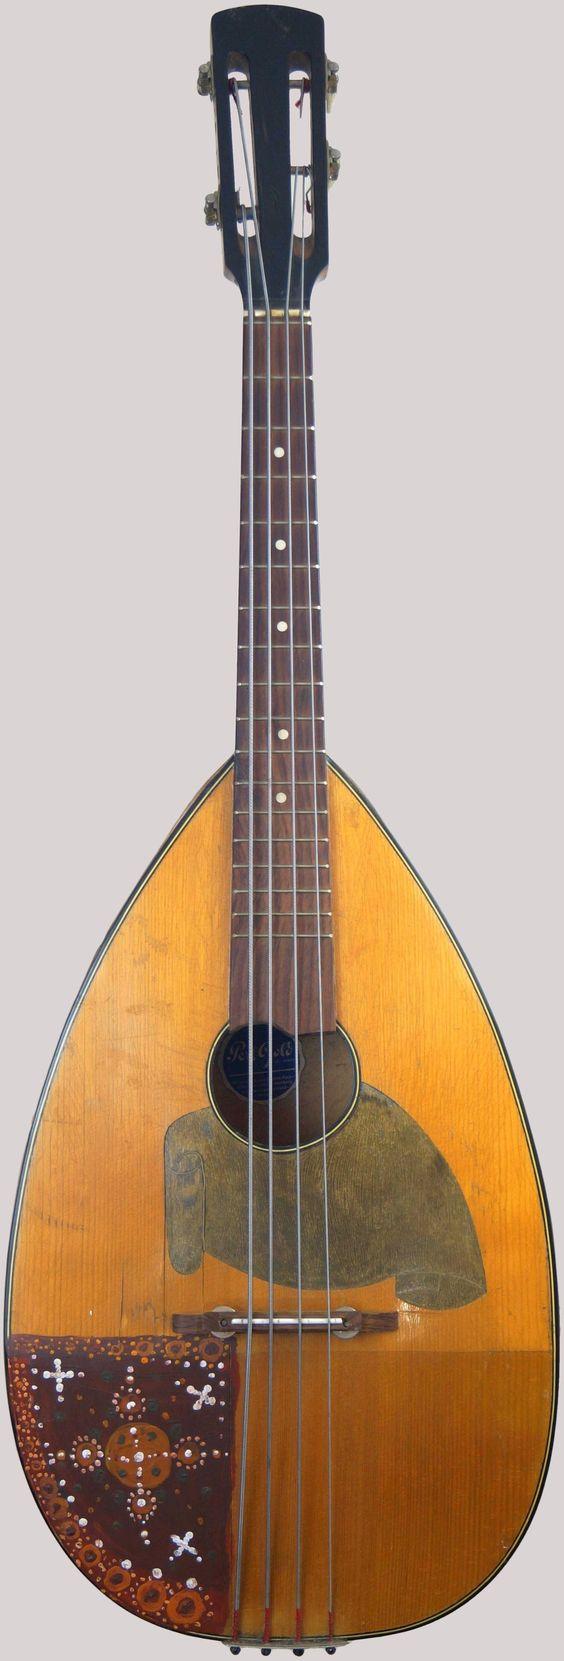 1930s 4 string flat back german Mandola